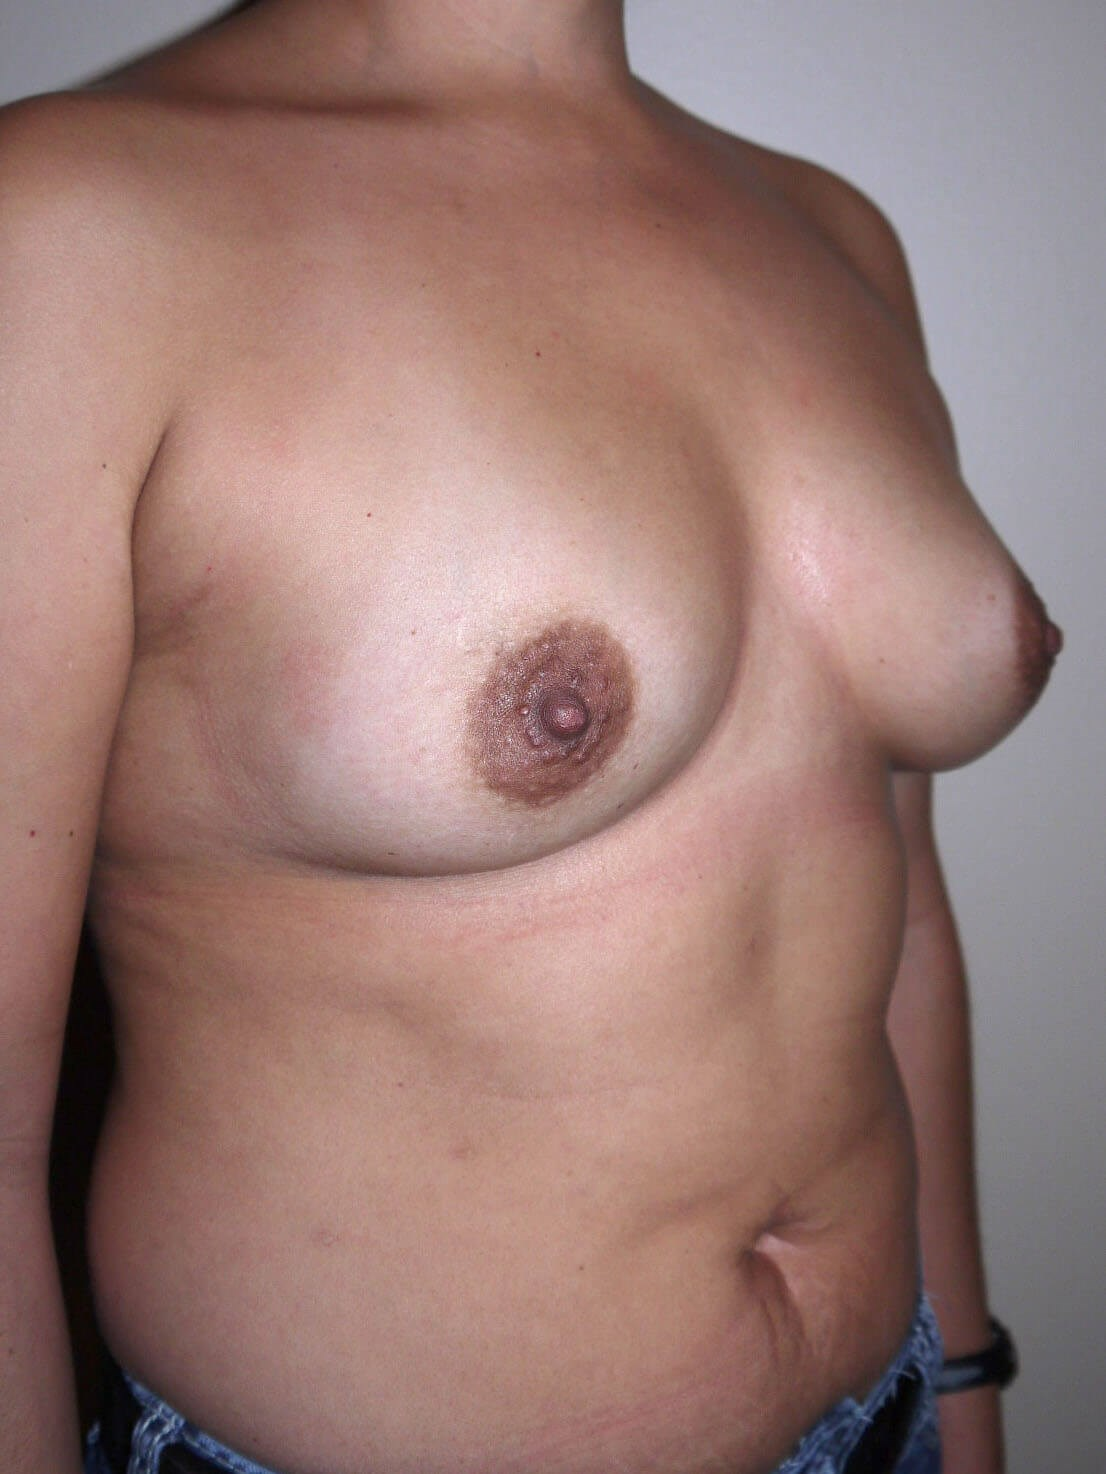 Before breast augmentation right Oblique View - right Oblique View